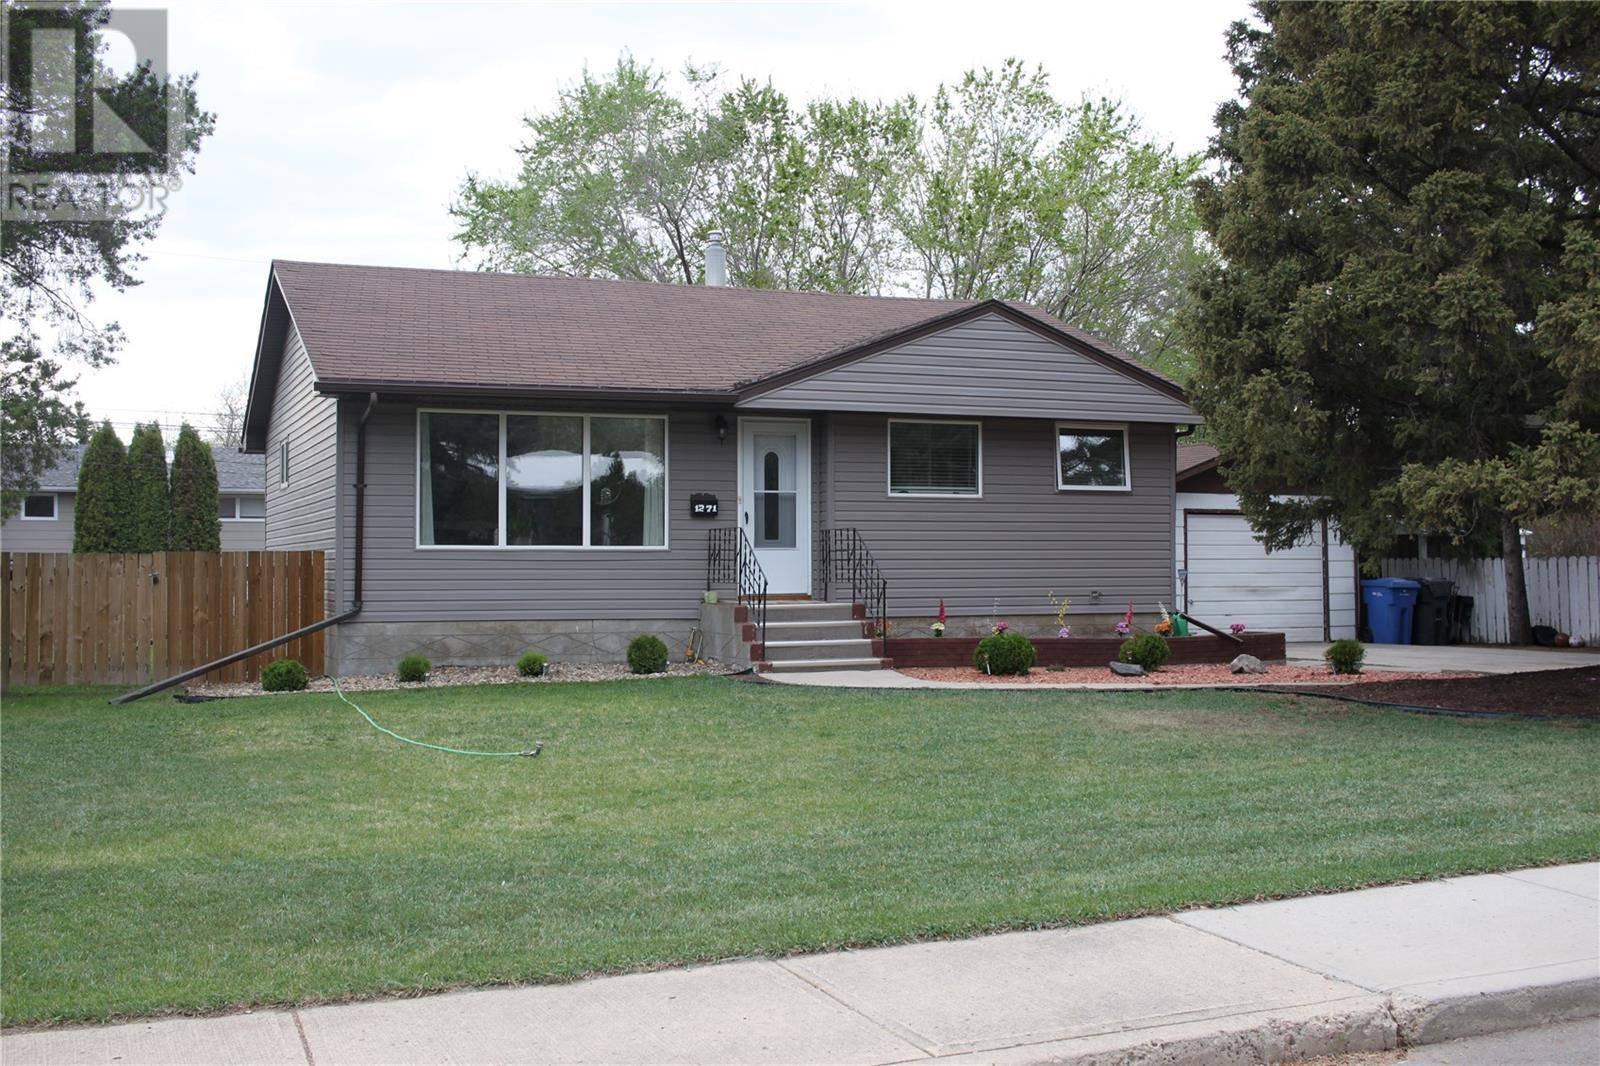 House for sale at 1271 112th St North Battleford Saskatchewan - MLS: SK773170